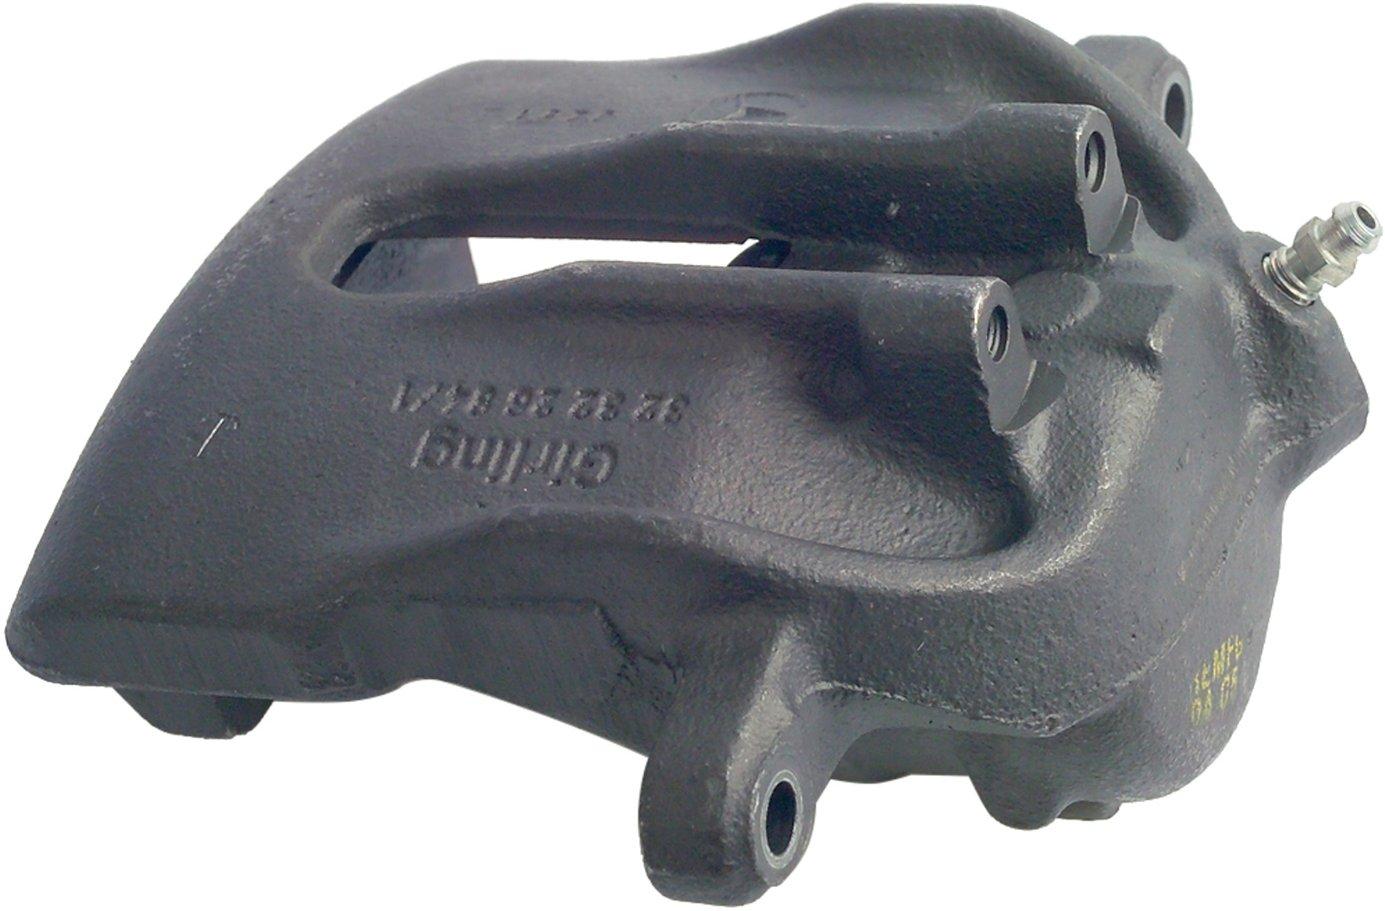 American Shifter 81549 Orange Metal Flake Shift Knob with M16 x 1.5 Insert White Shift Pattern 42n